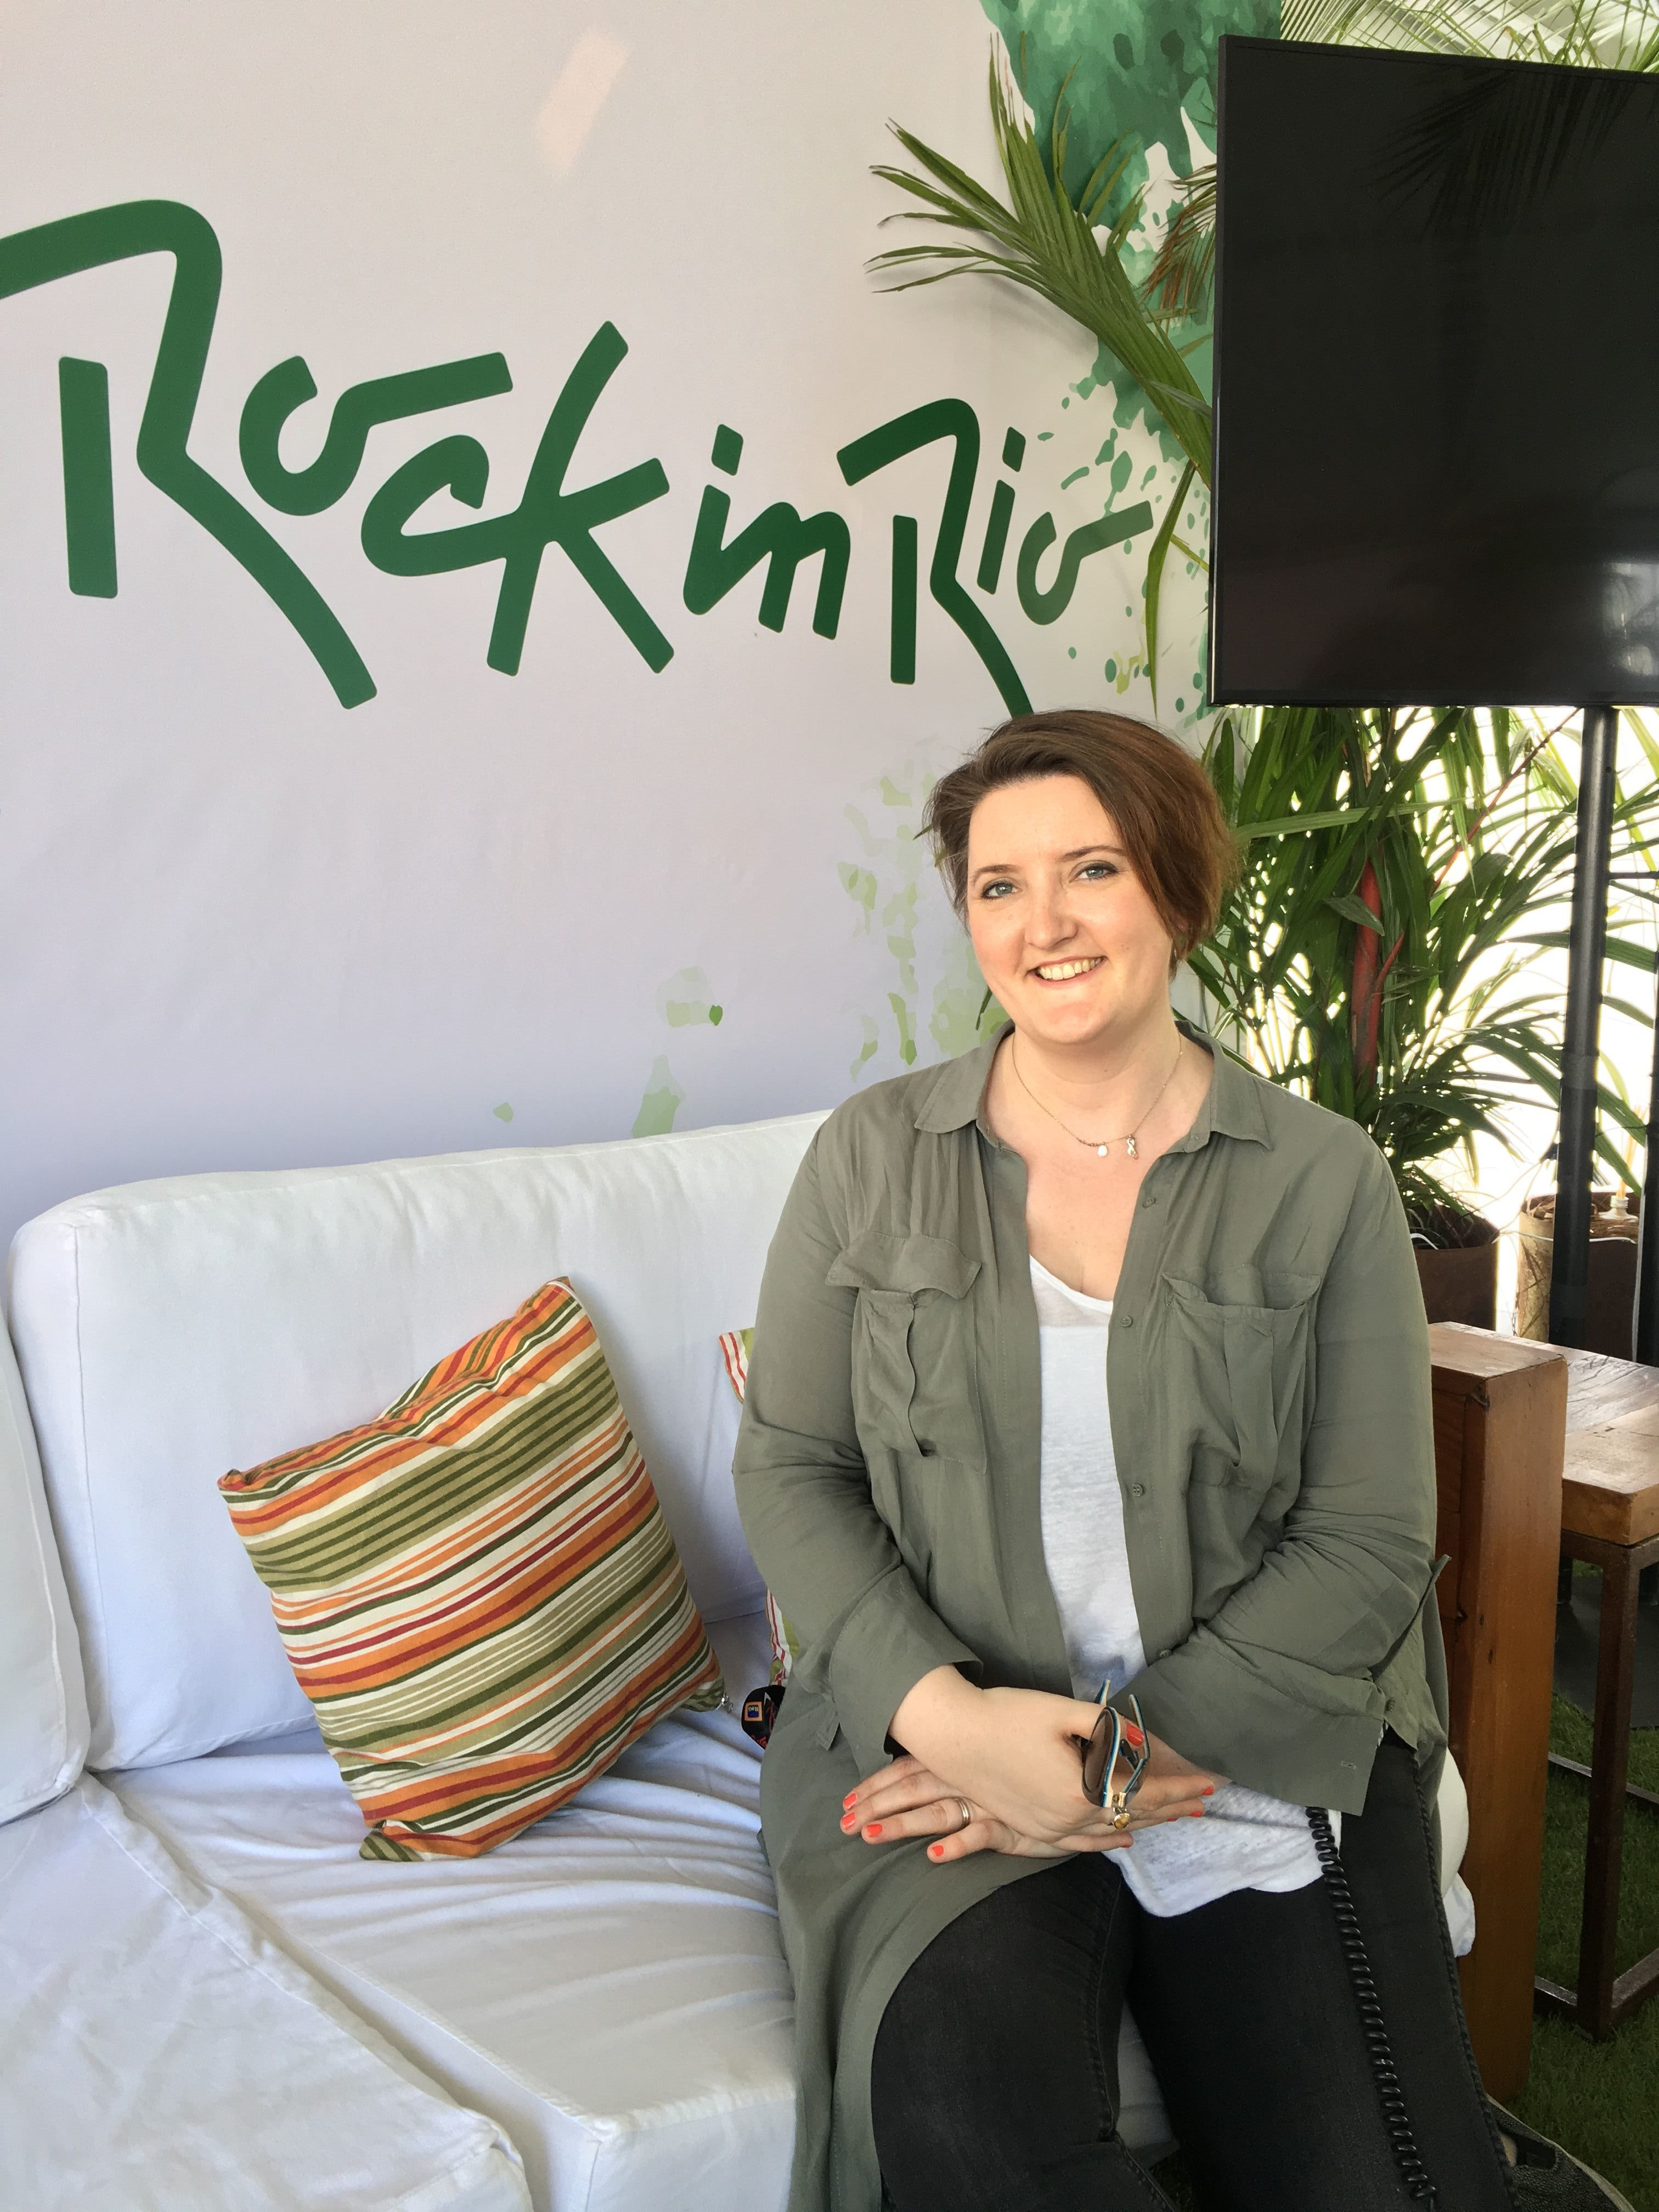 Image of Hannah Kinkade smiling